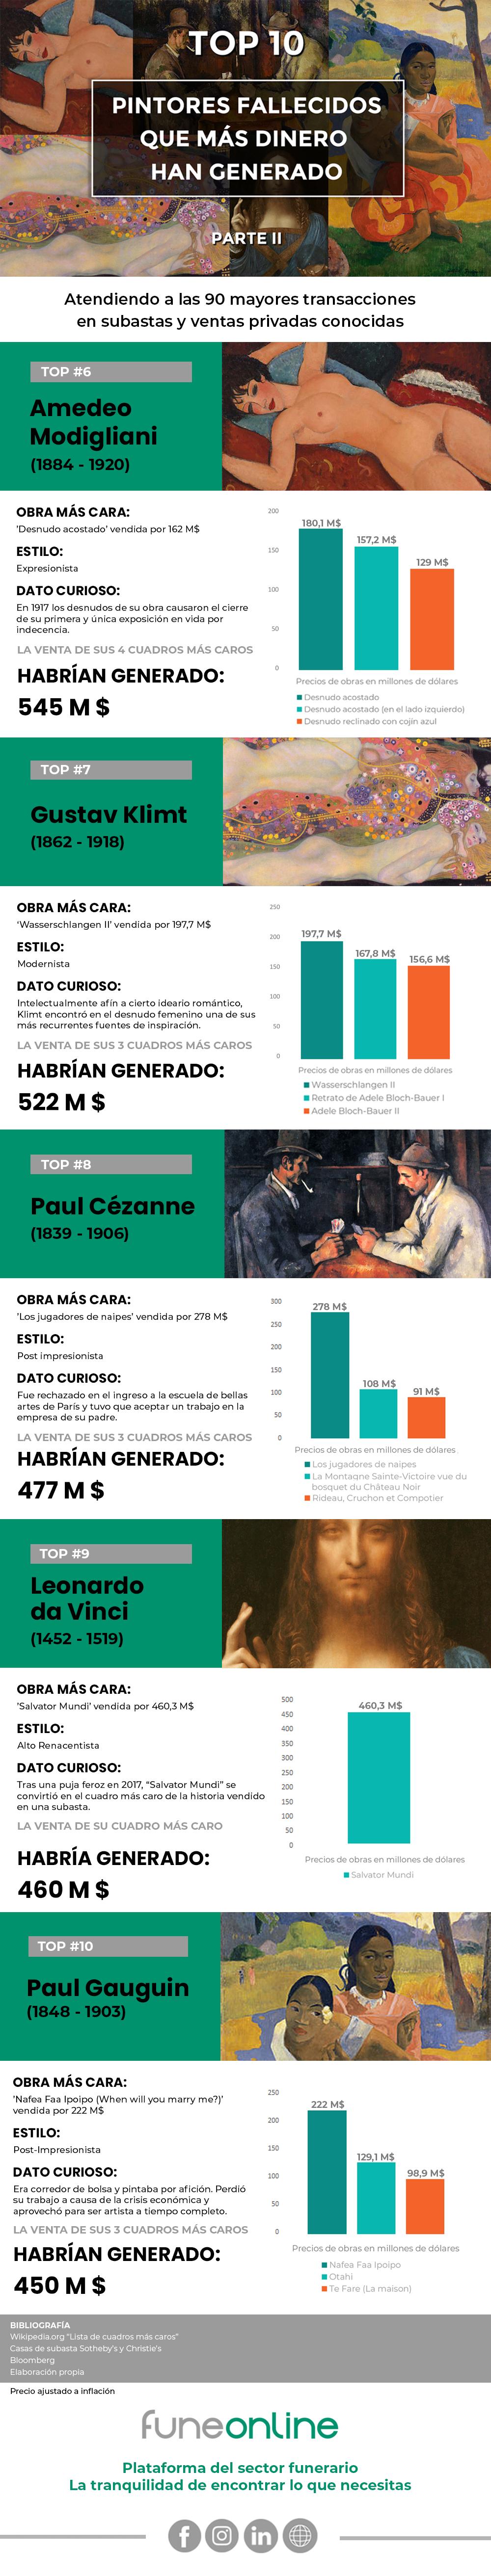 Infografía blog funeonline.com